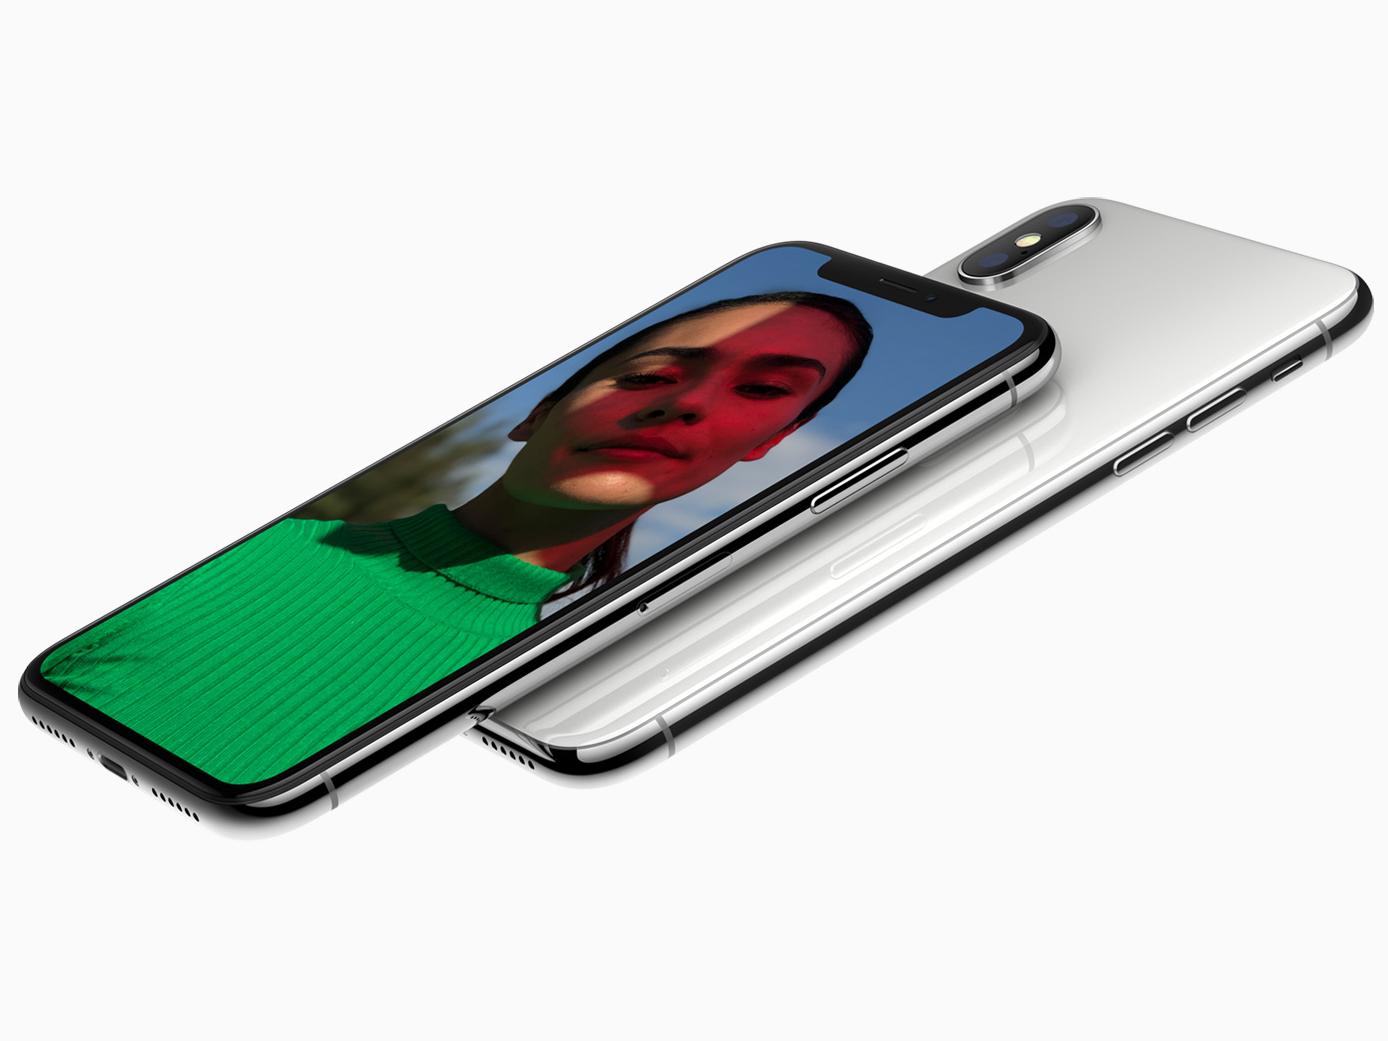 cf1edbd40f3b Apple iPhone X Smartphone Review - NotebookCheck.net Reviews